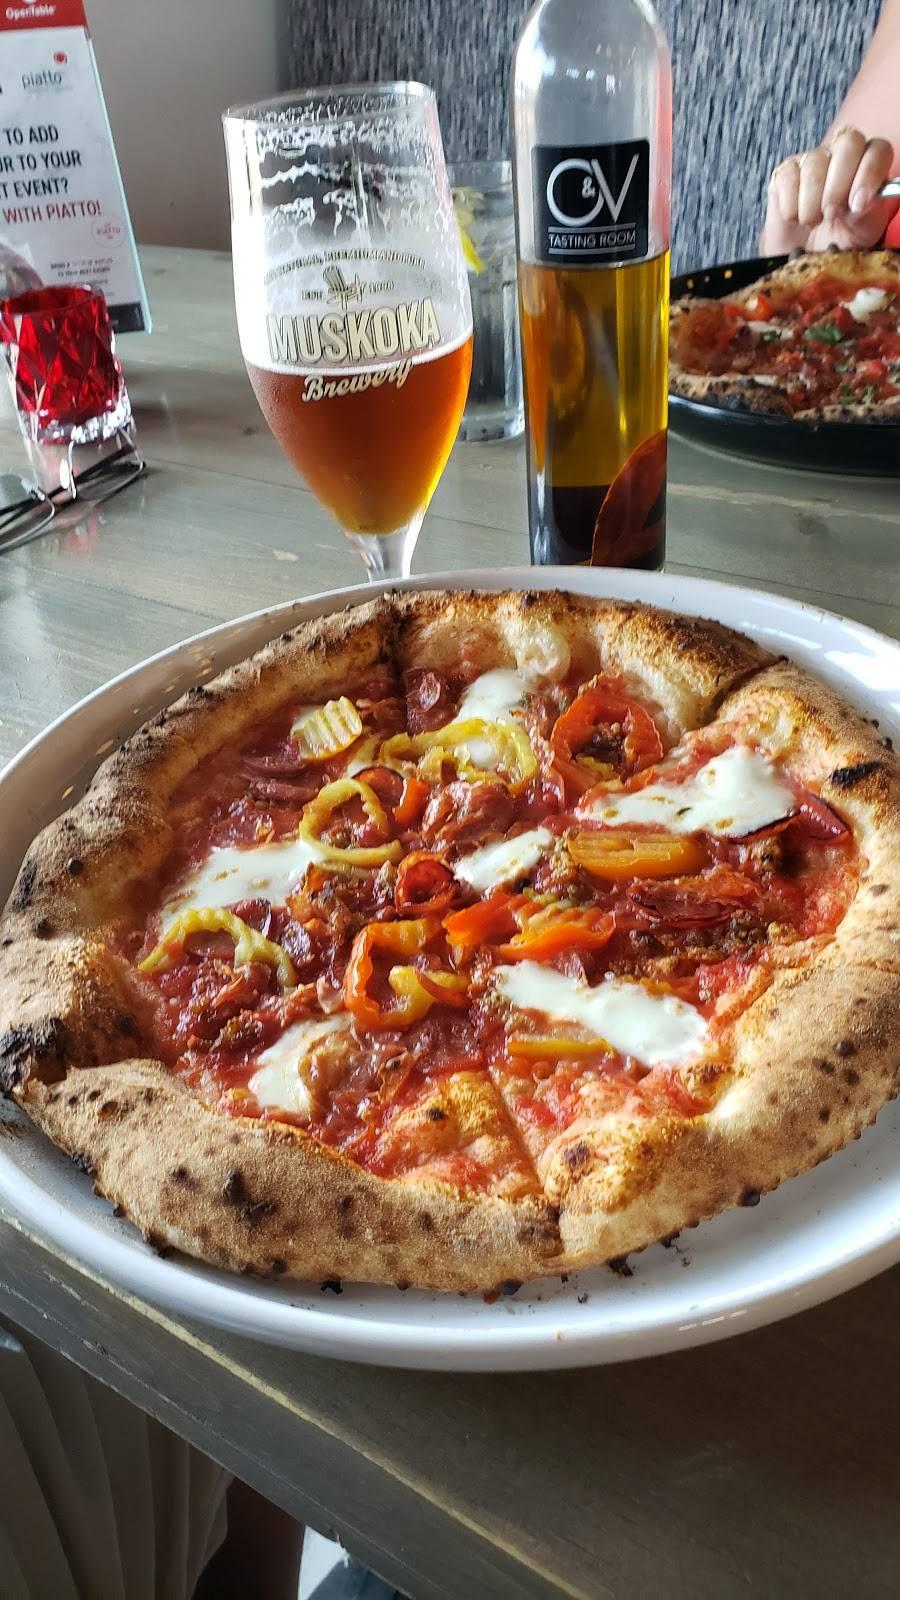 Piatto Pizzeria Cambridge | restaurant | 350 Hespeler Rd #1, Cambridge, ON N1R 6J6, Canada | 5192677909 OR +1 519-267-7909